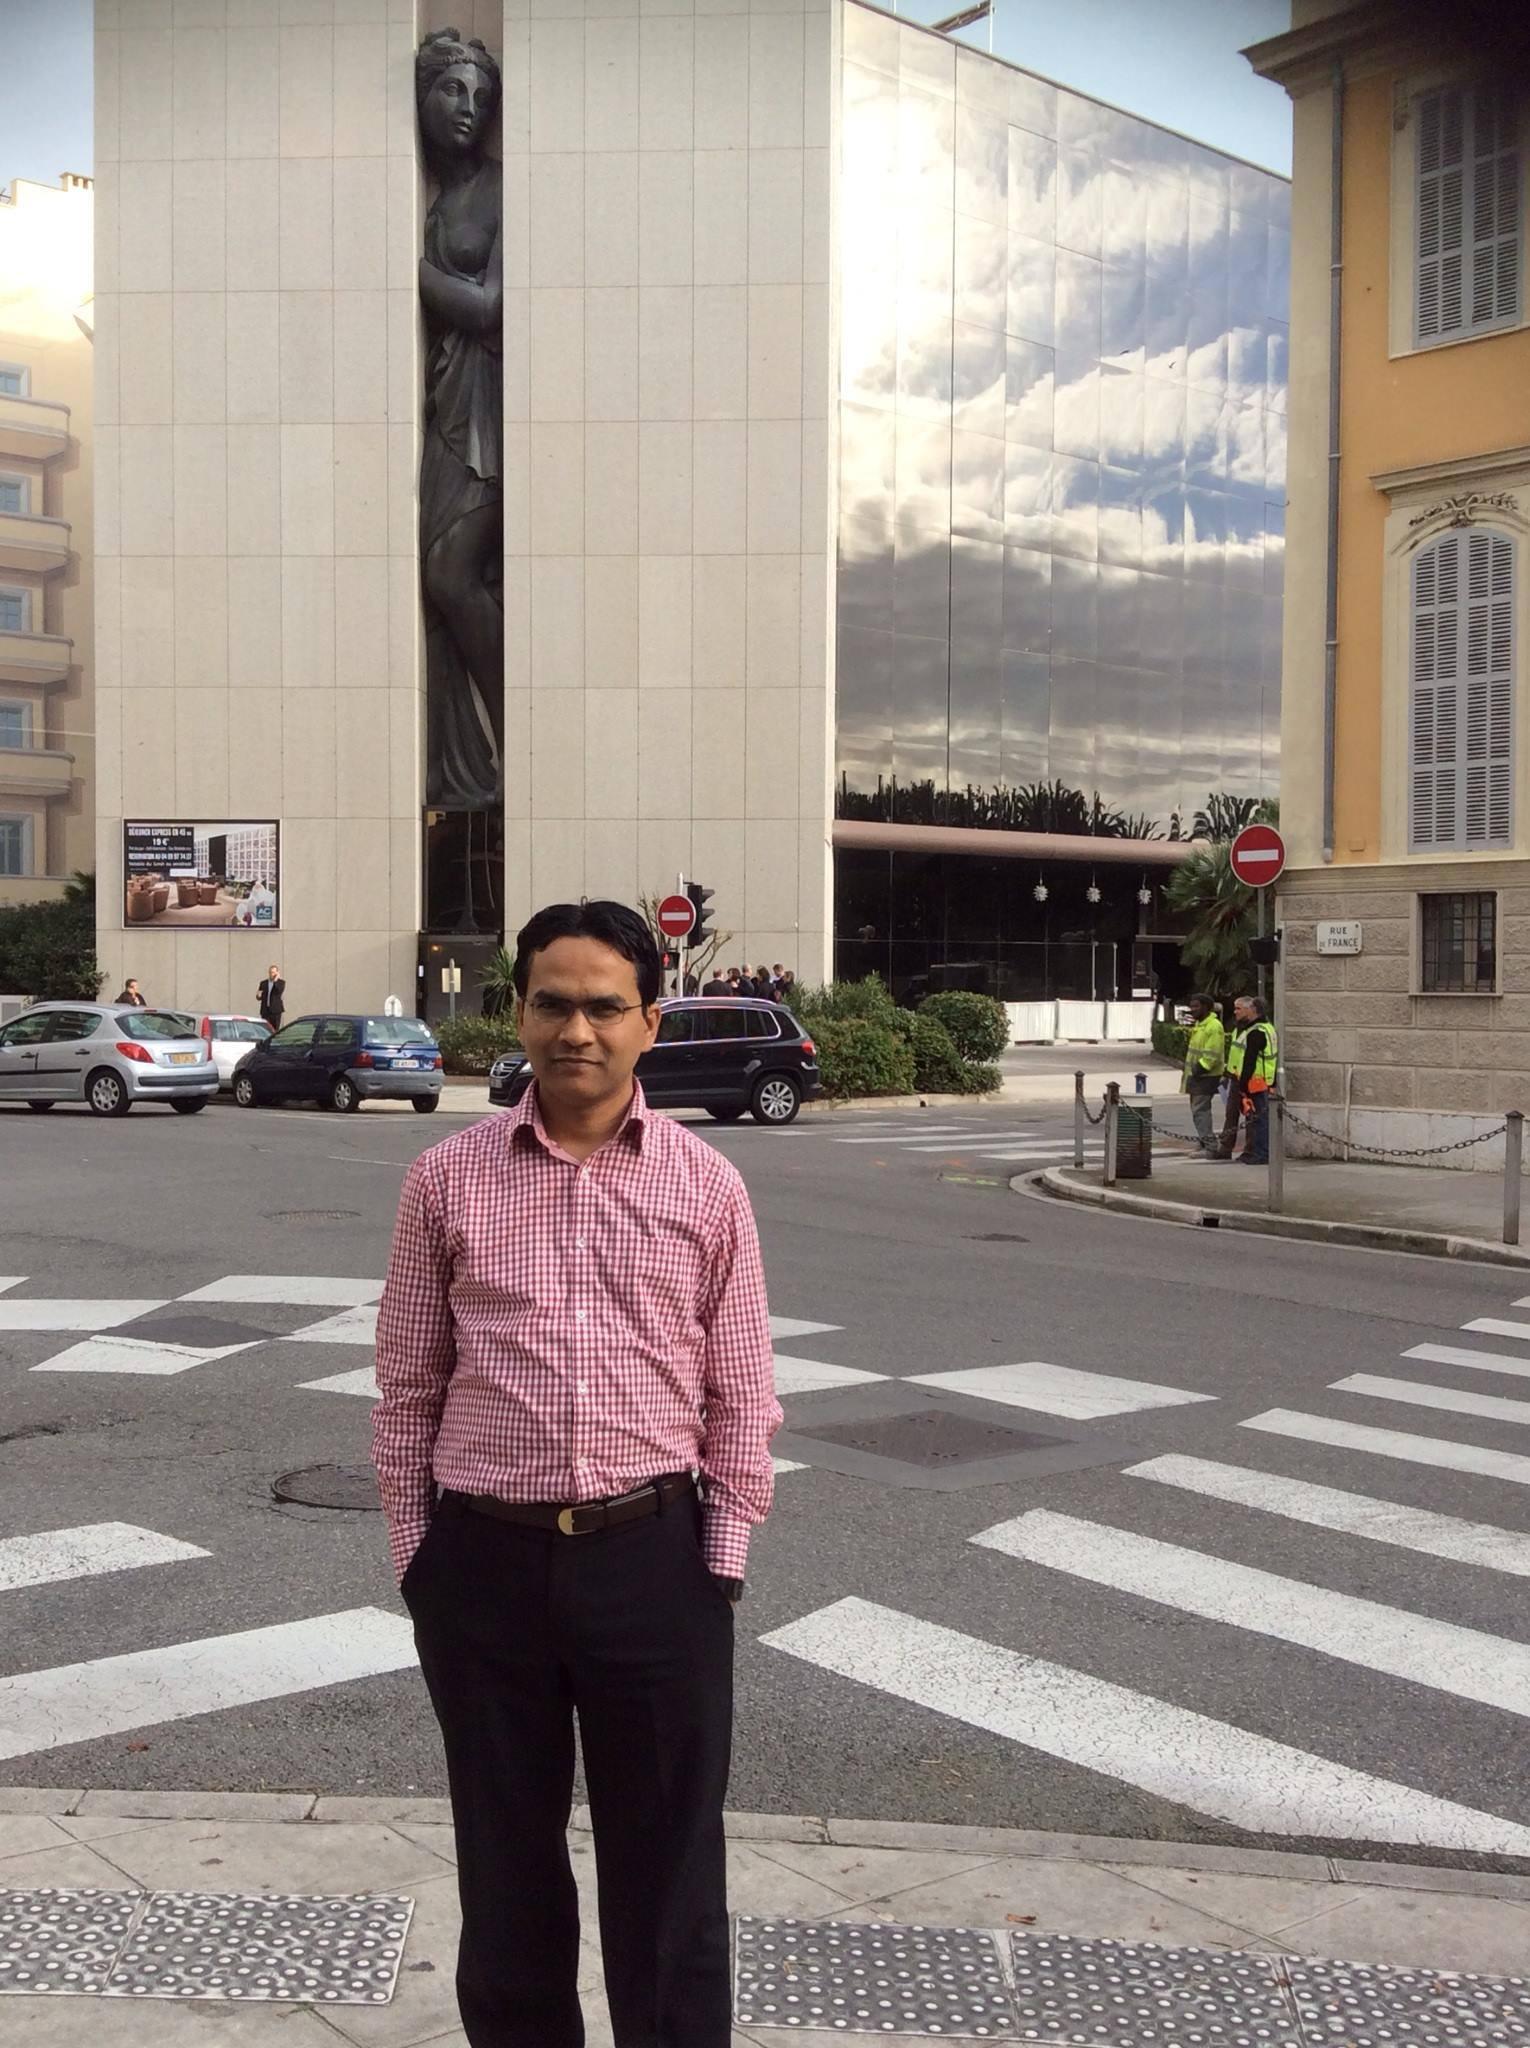 डा. बिश्व पौडेल  बने  राष्ट्रिय योजना आयोगको उपाध्यक्ष